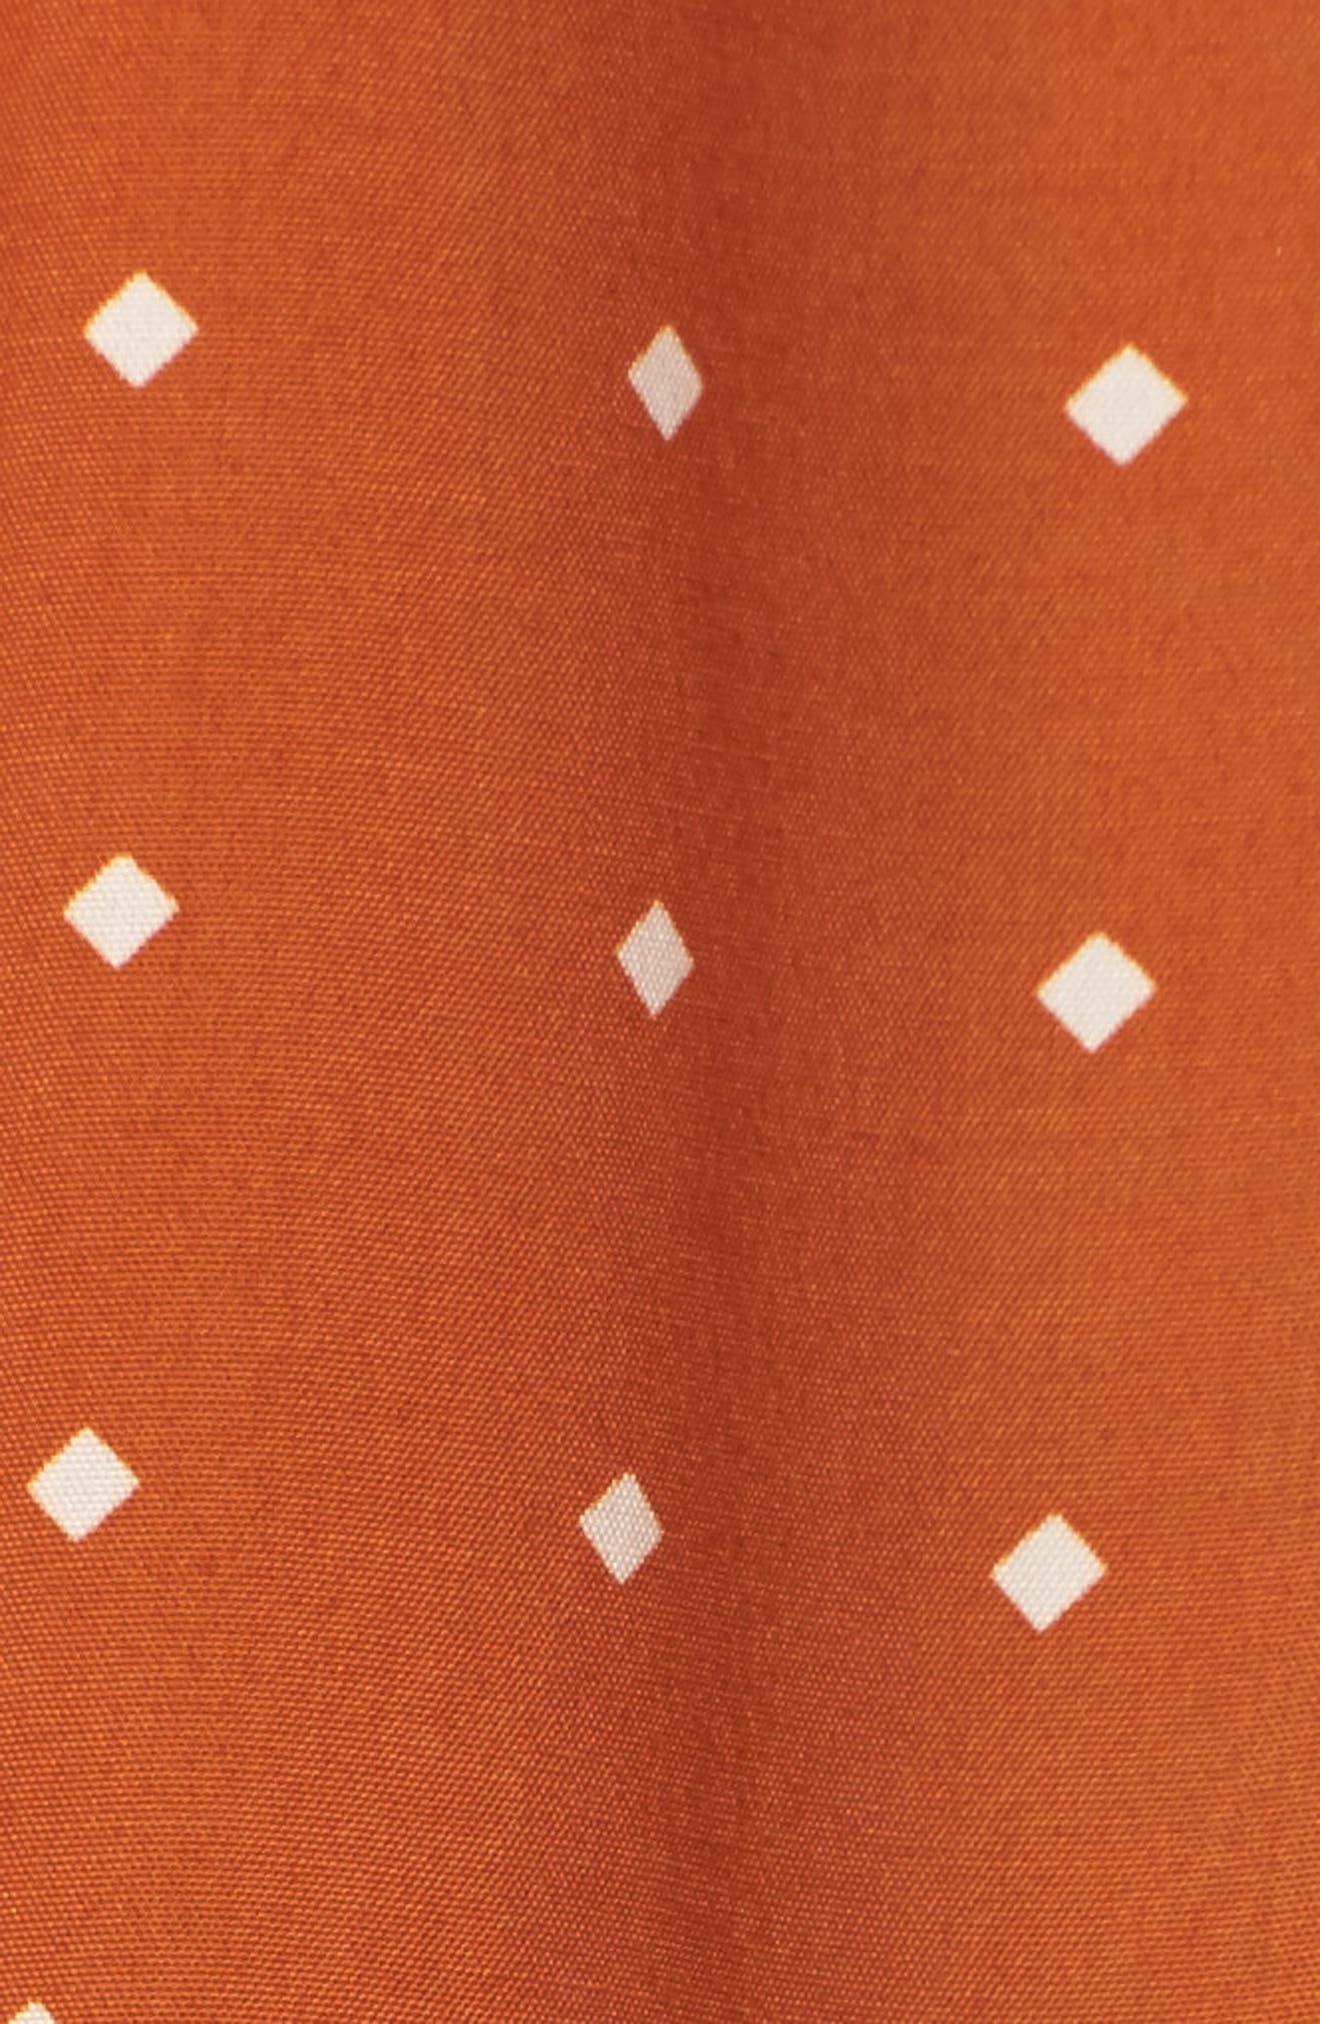 Santa Rosa Maxi Dress,                             Alternate thumbnail 5, color,                             Stefano Print - Ginger